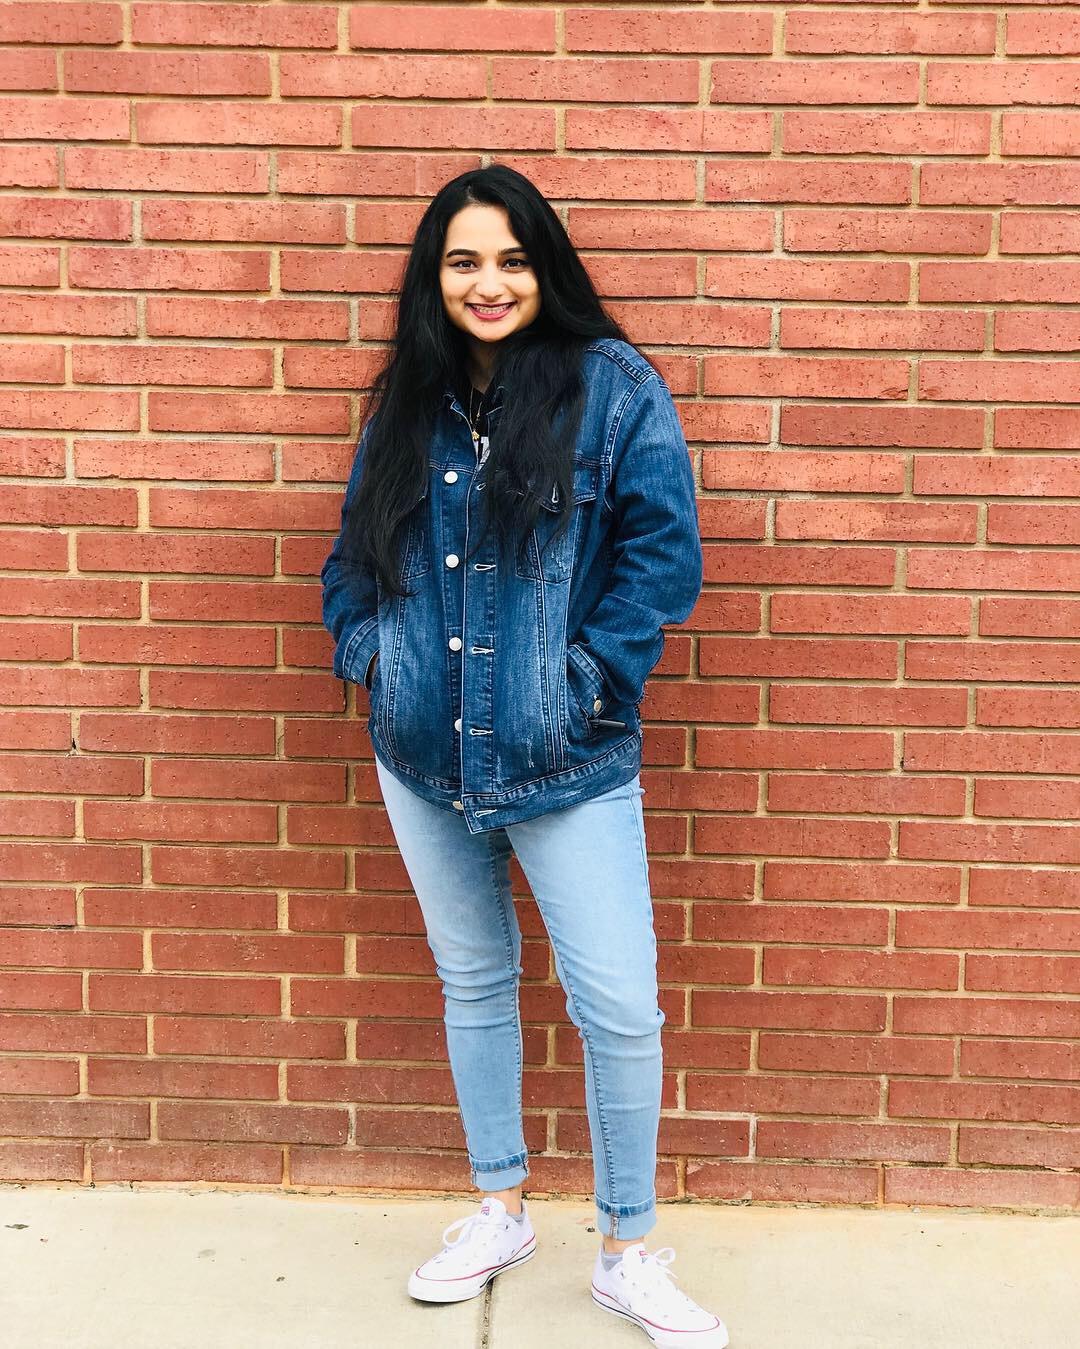 Michelle Sajjad